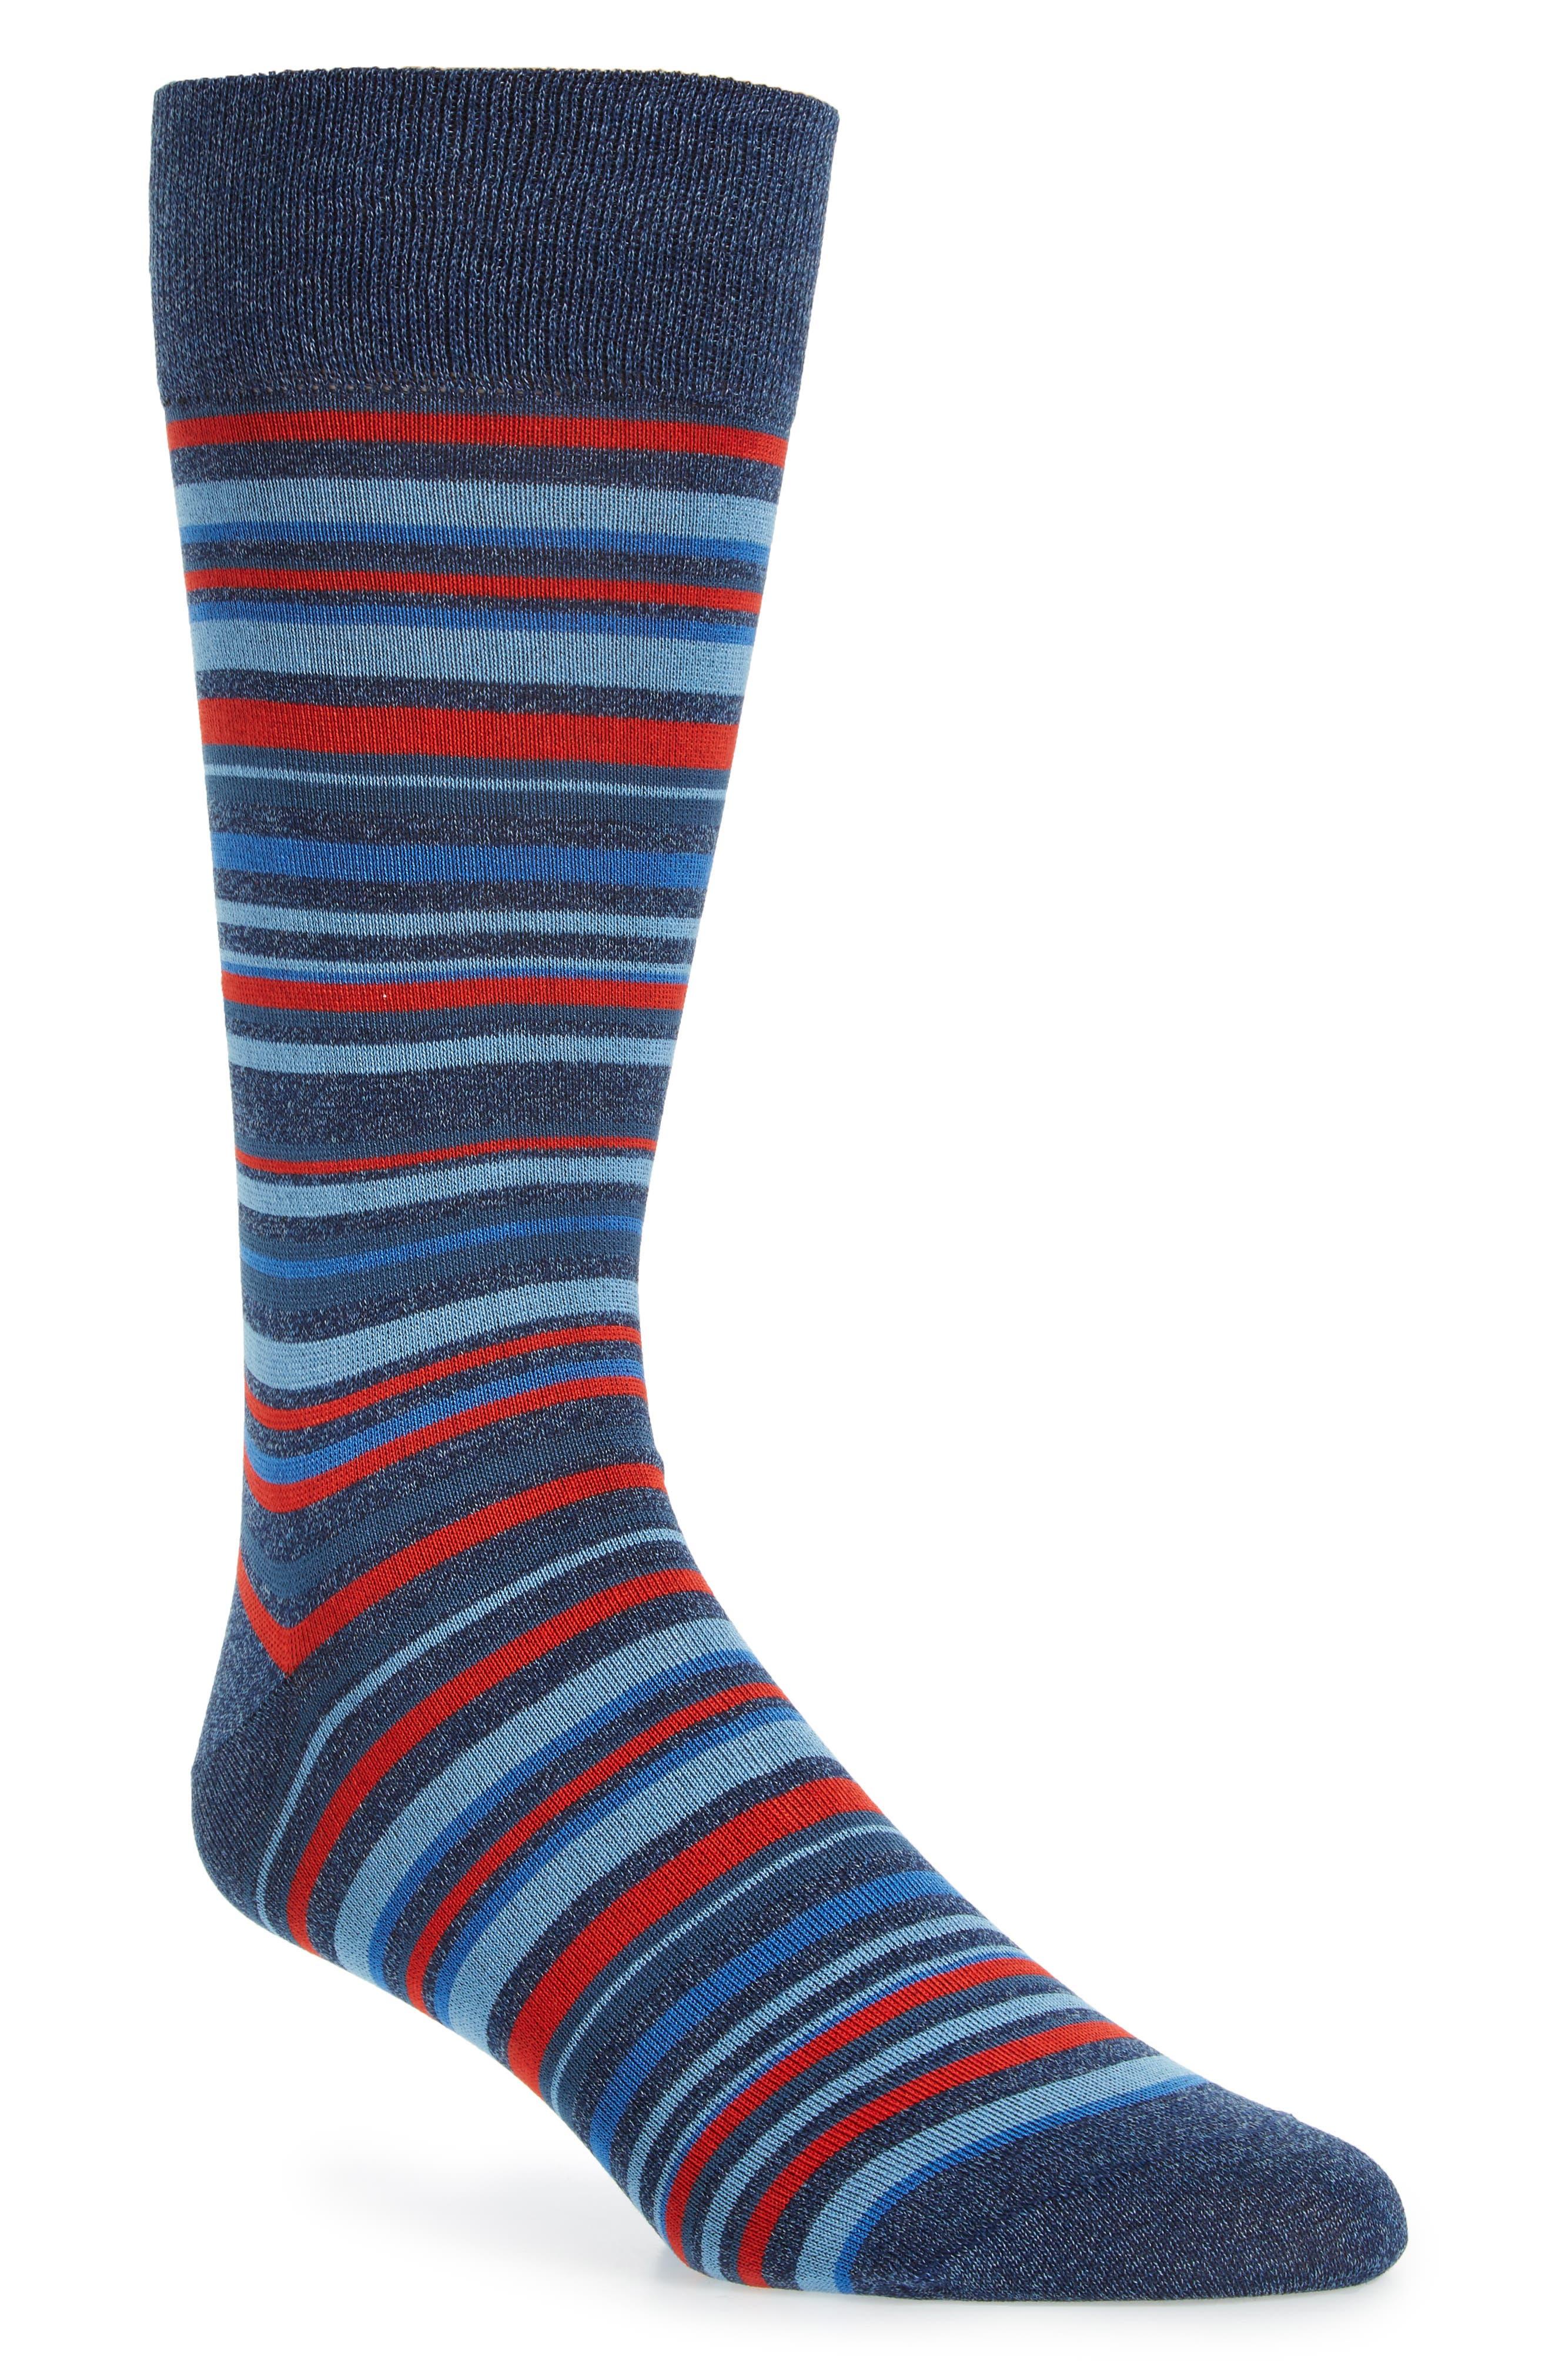 Cotton Blend Socks,                             Main thumbnail 1, color,                             Denim